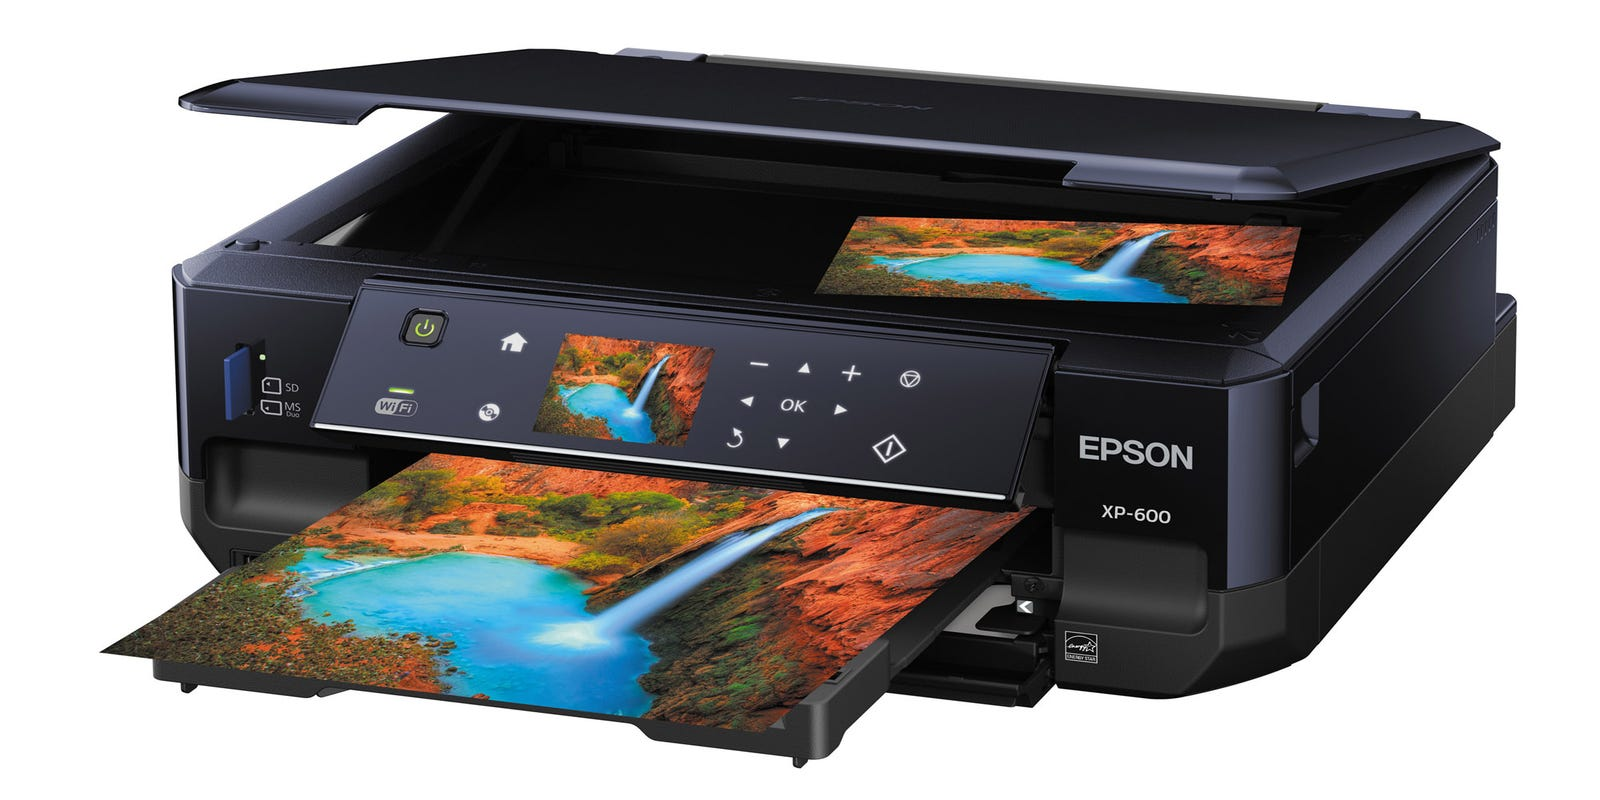 Craigslist Indianapolis Free Stuff >> Sale Of 40 Printer Leads To 30 000 Lawsuit